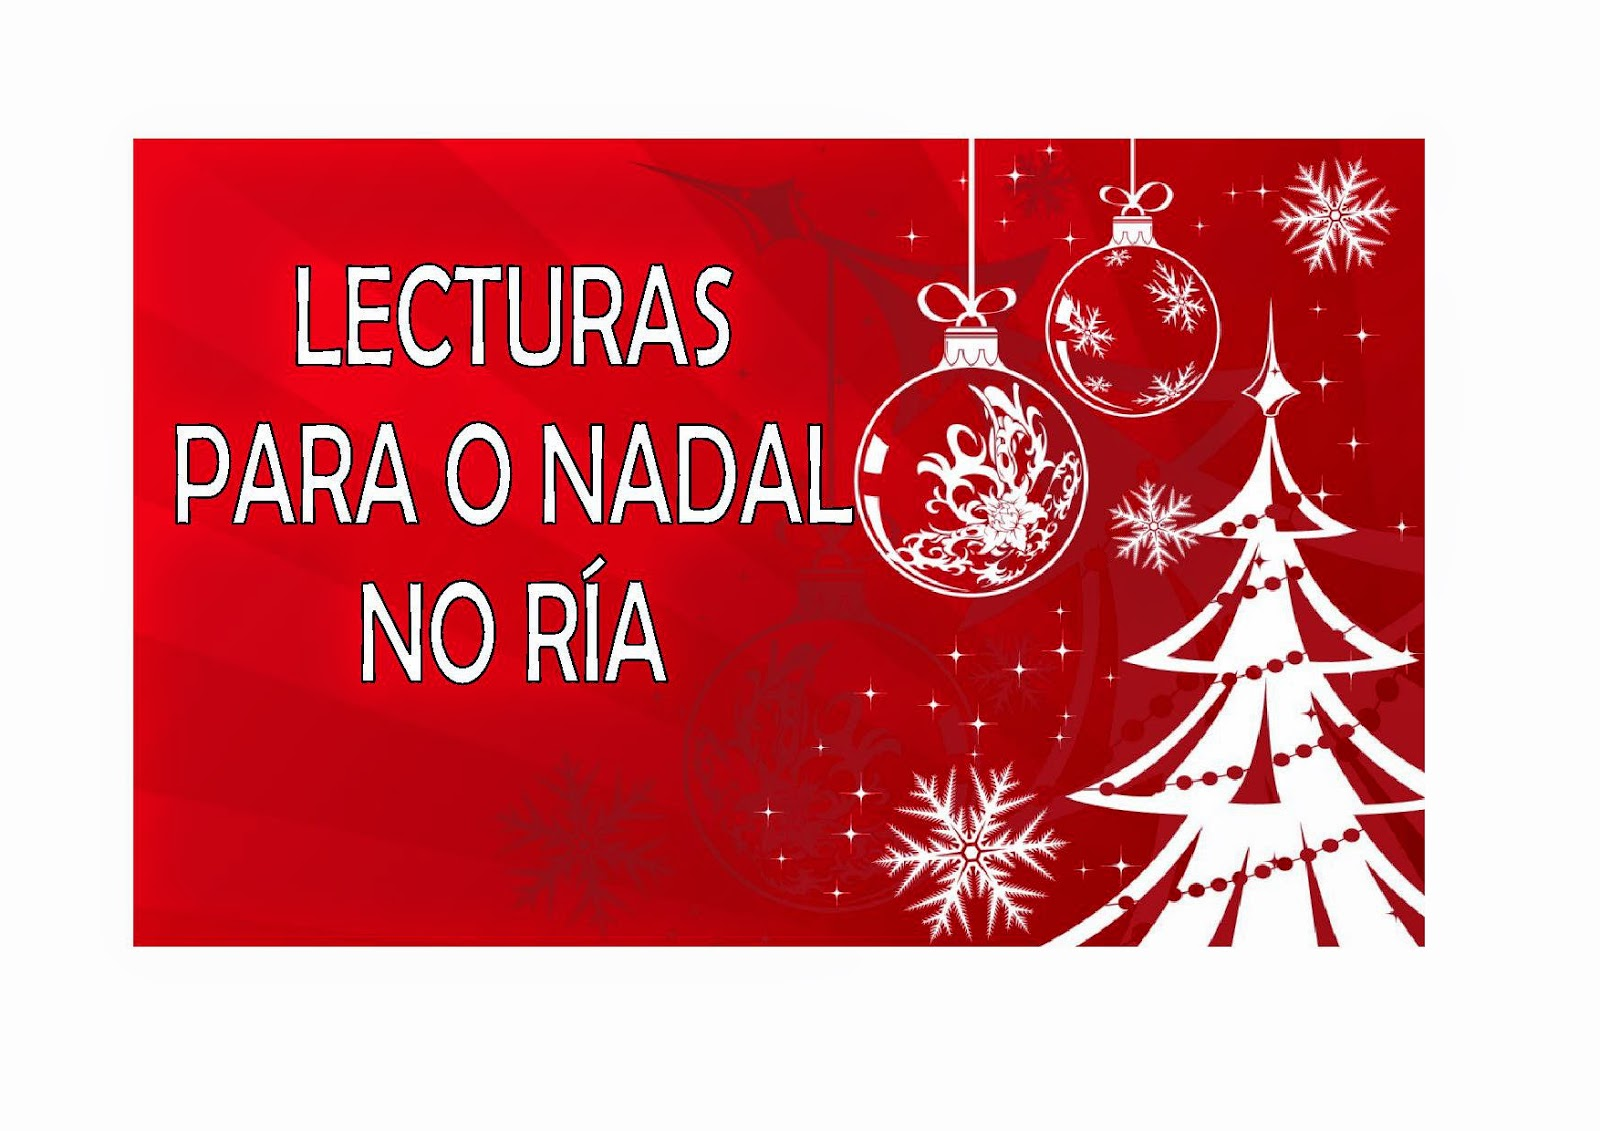 http://issuu.com/biblioria2014/docs/librosparaagasallarnonadal/1